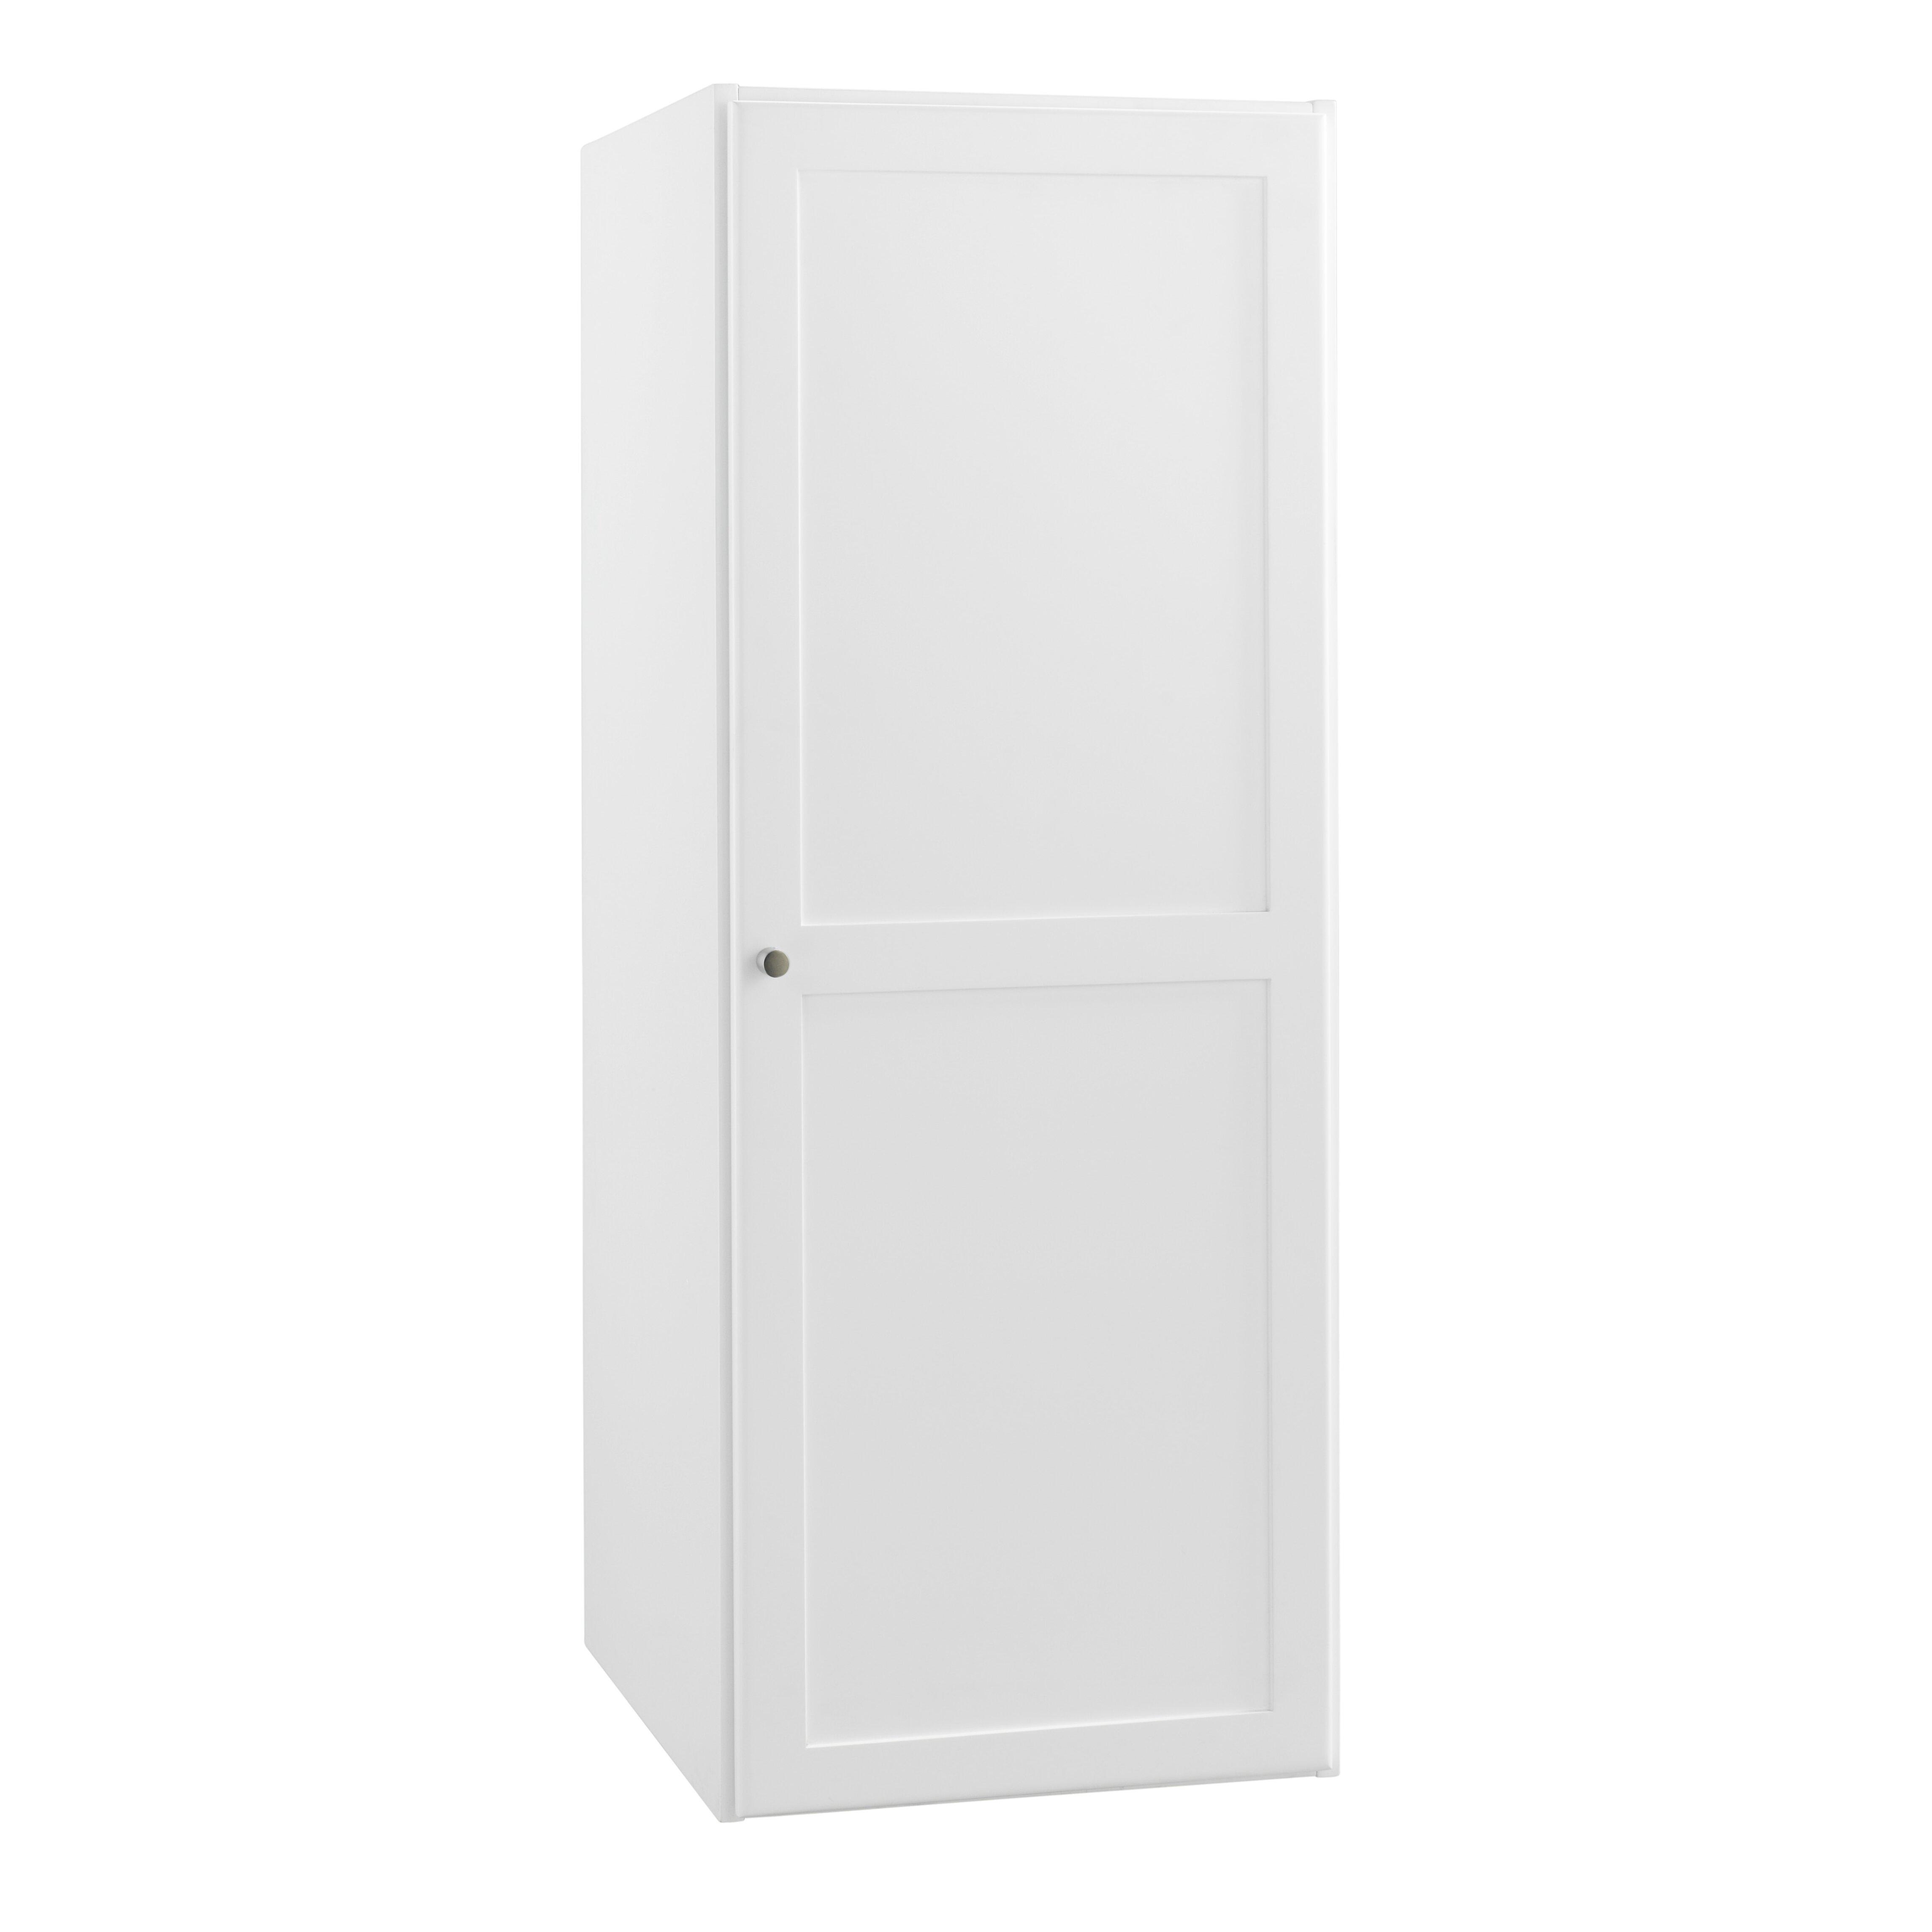 90 bathroom vanity Bathroom Design Ideas  88 inch Modern Double. Tin Bathroom Signs